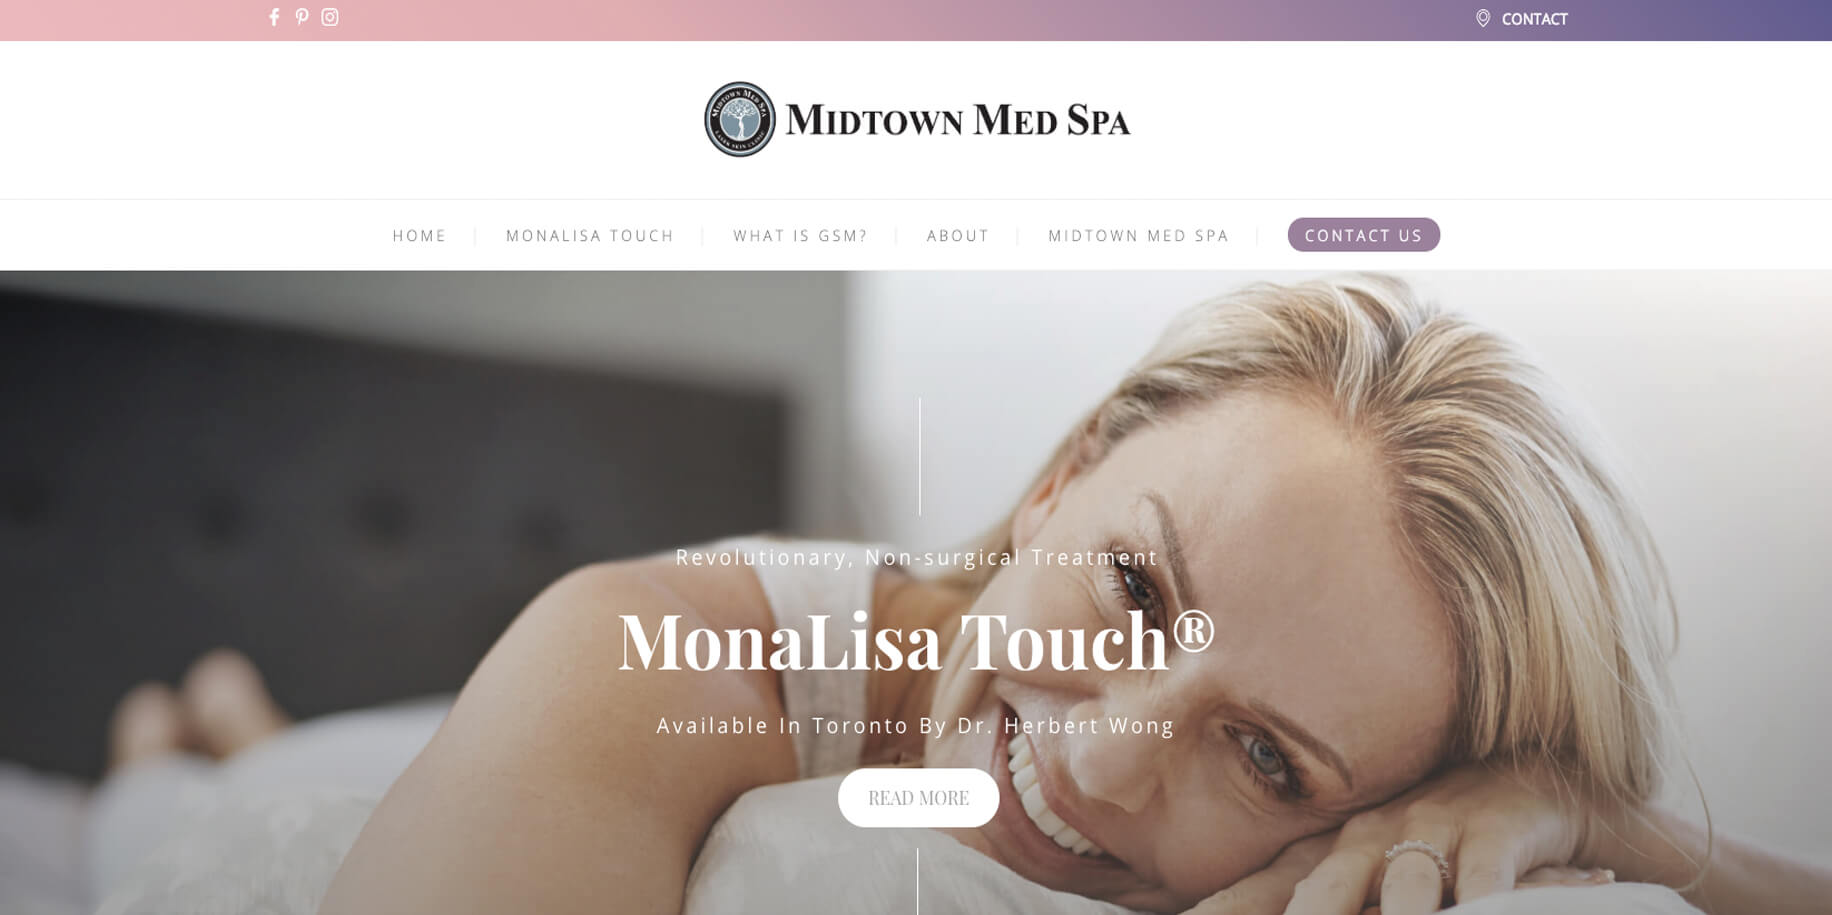 monalisa4me-featured-1